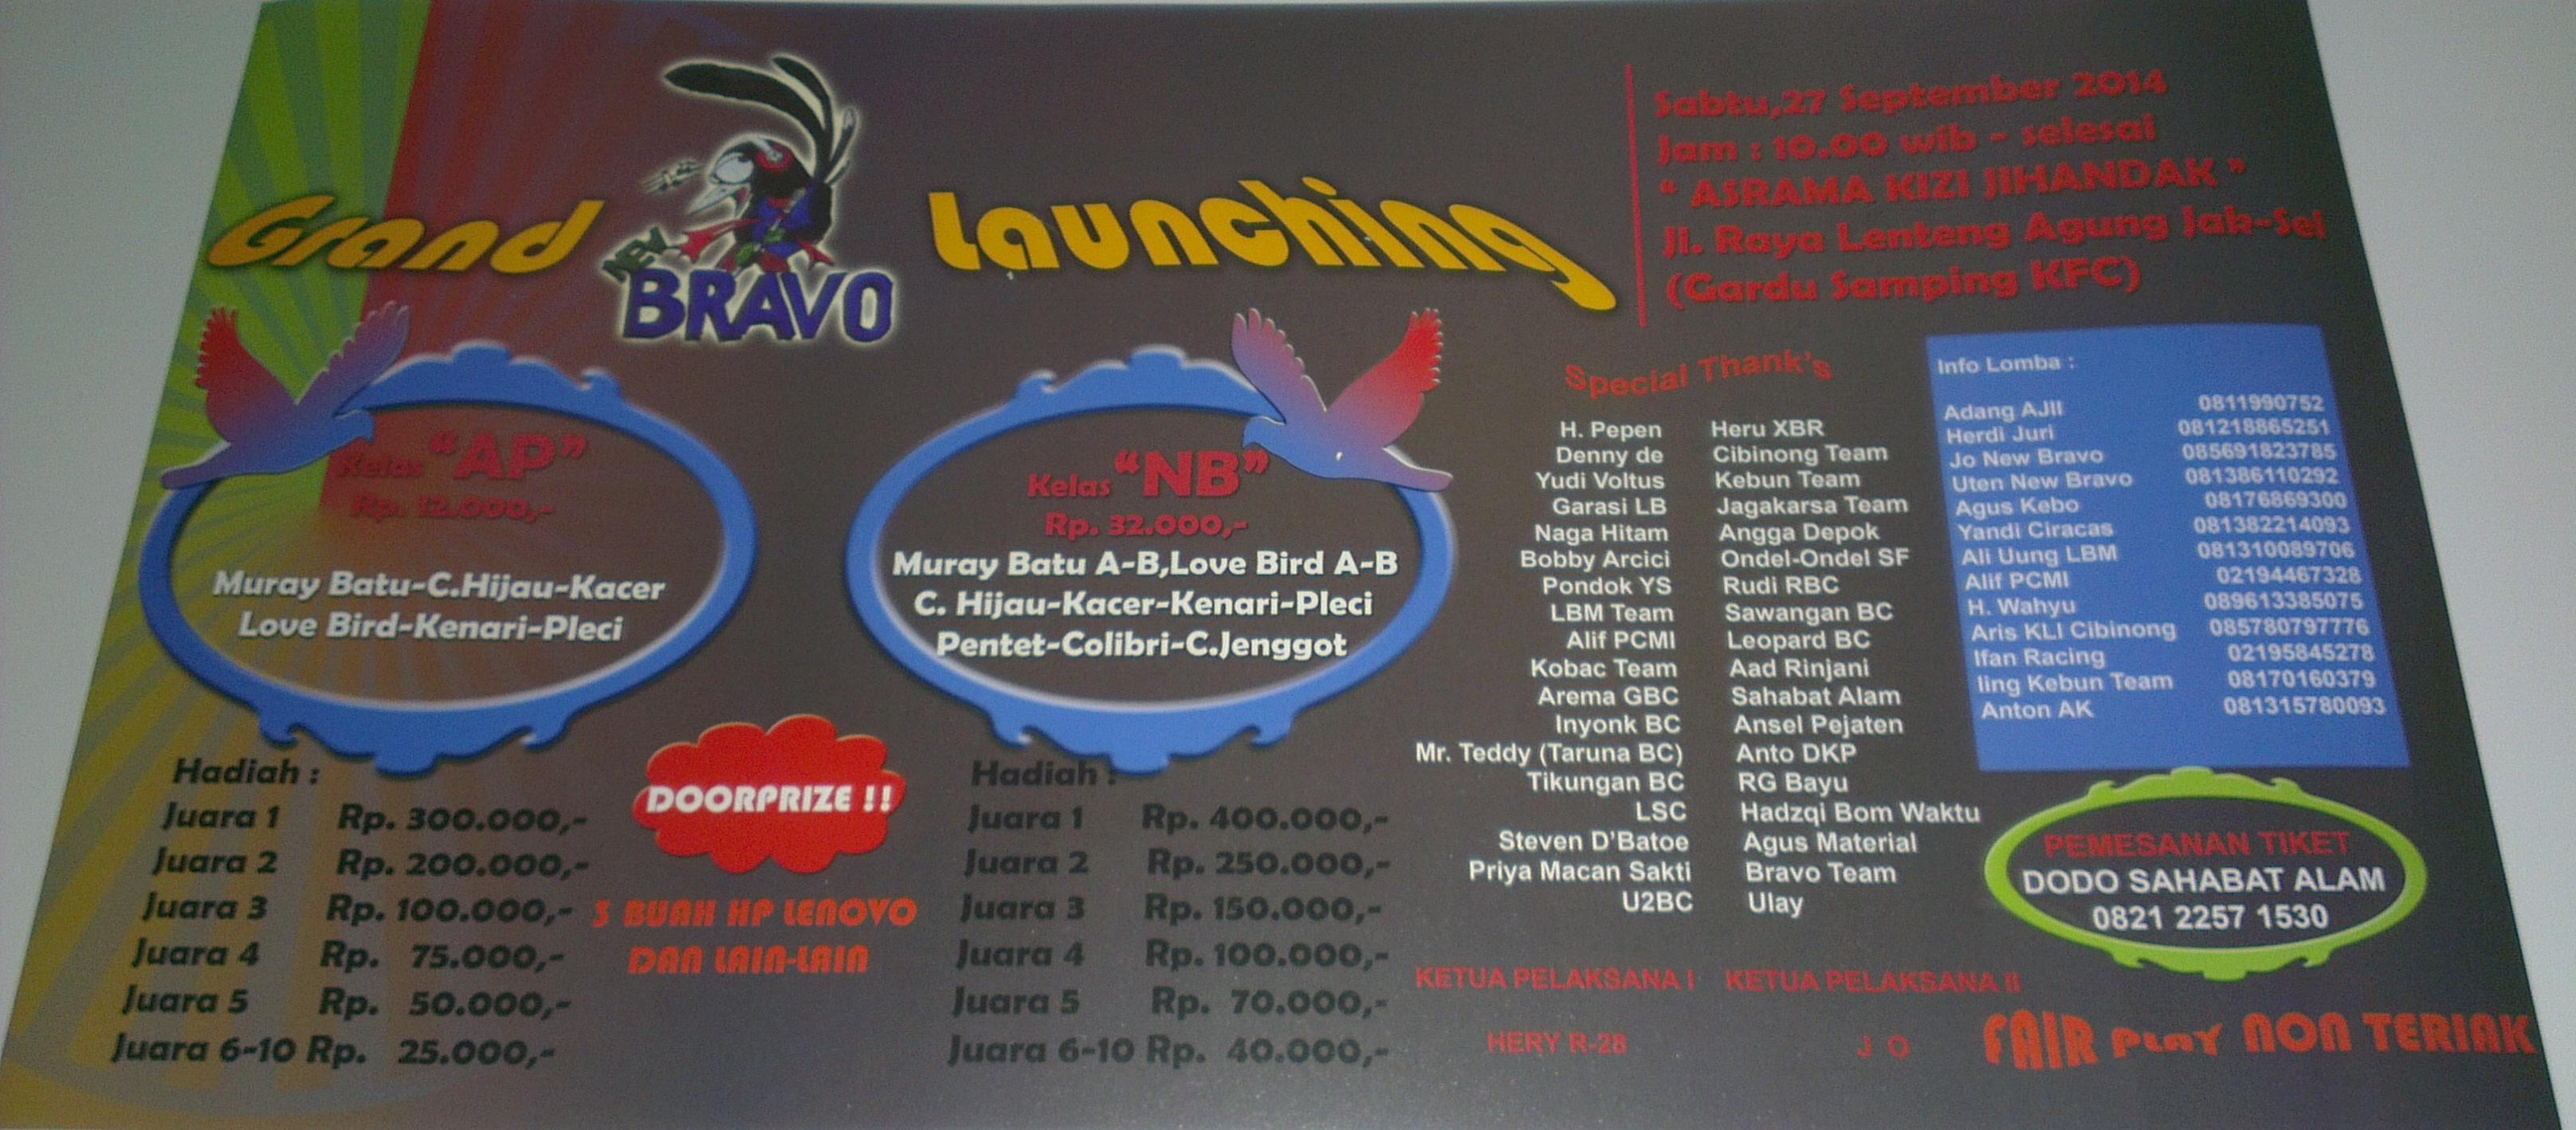 Brosur Lomba Burung Berkicau Grand Launching New Bravo, Jakarta Selatan, 27 September 2014